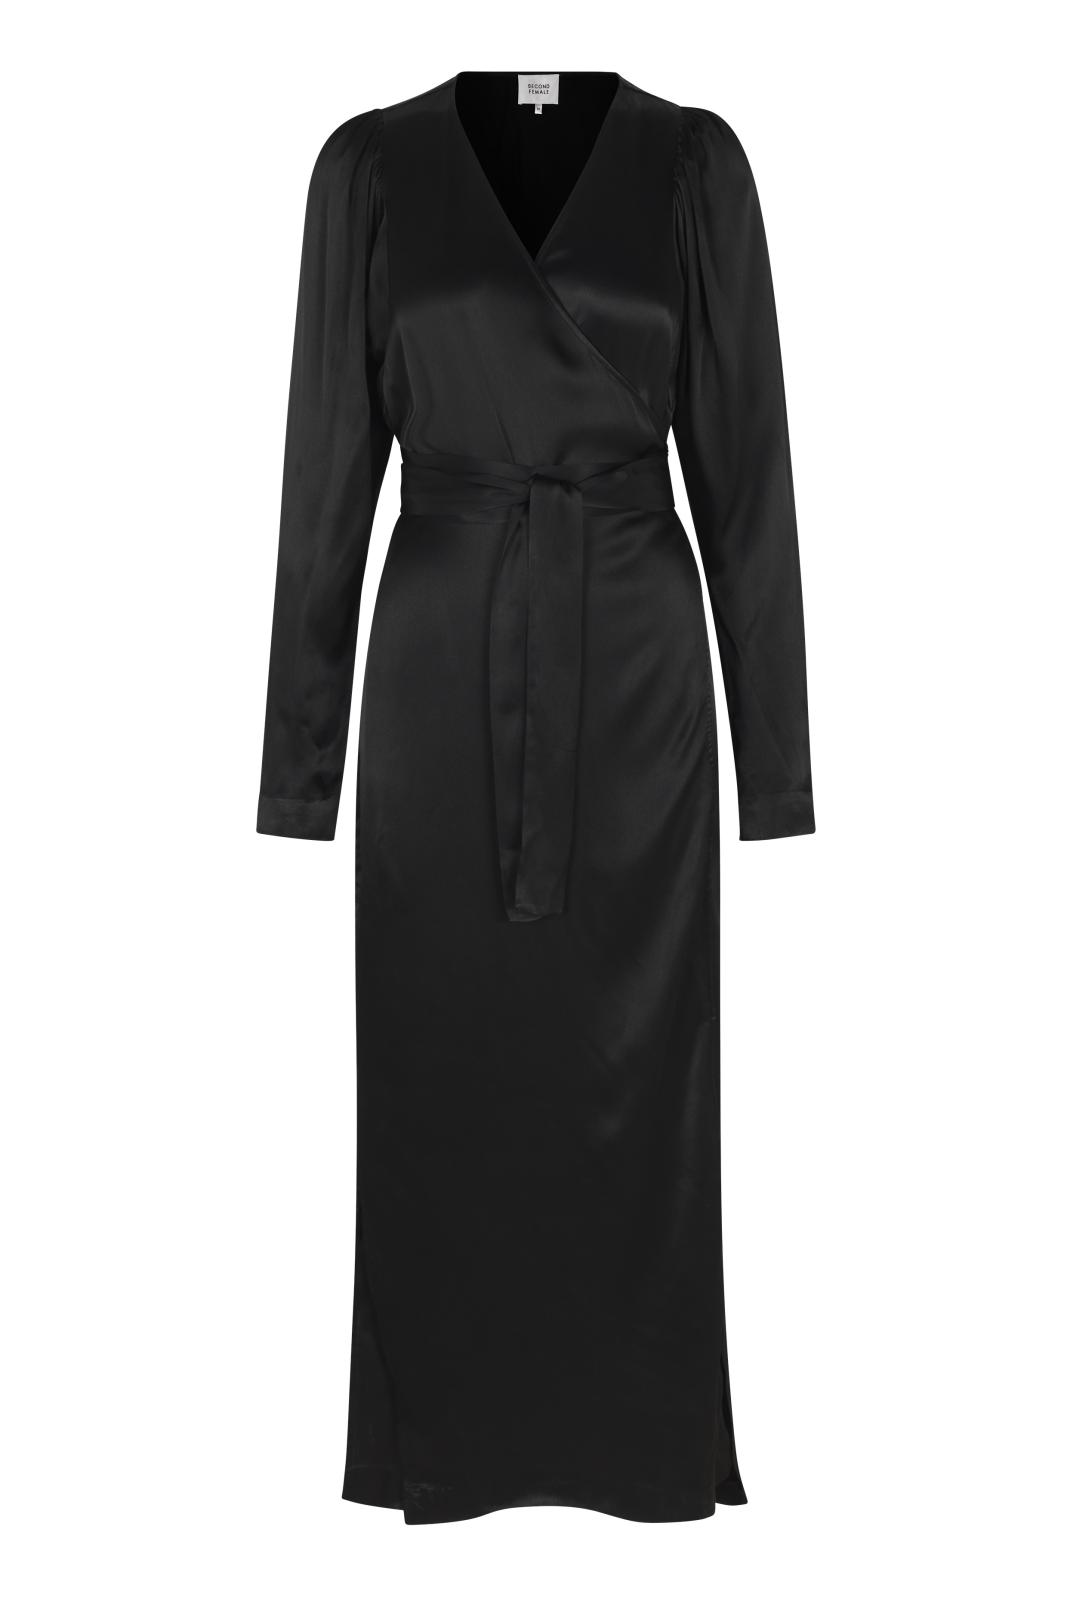 Klänningar & Kimonos Nathalie Store